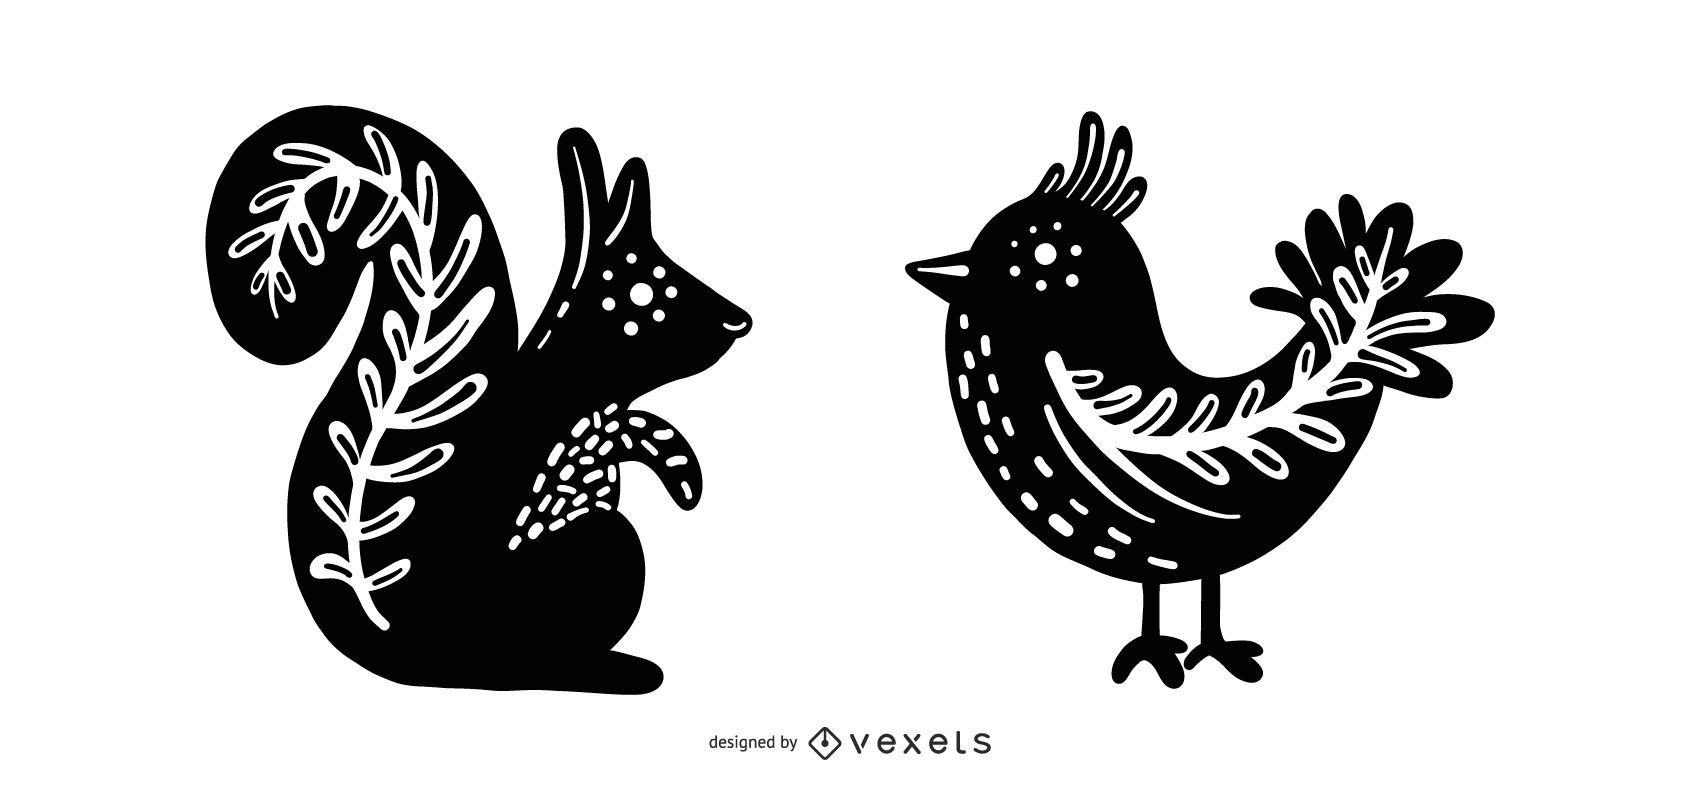 Scandinavian Folk Design Animal Silhouettes